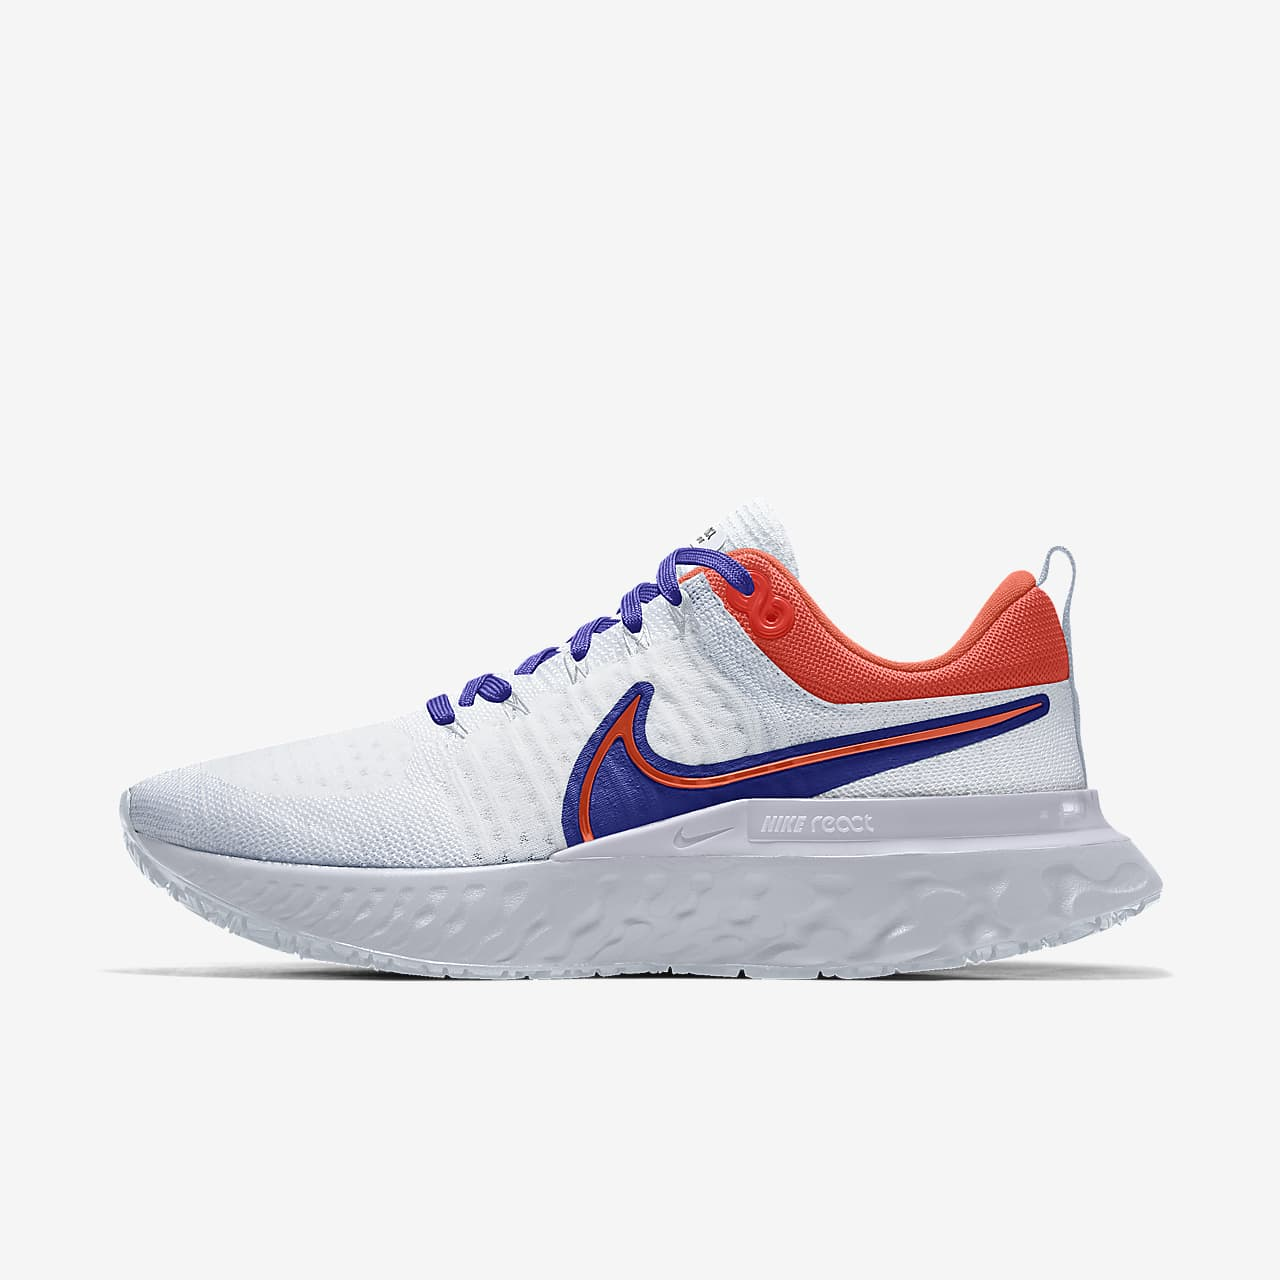 Nike React Infinity Run Flyknit 2 By You Men's Road Running Shoes